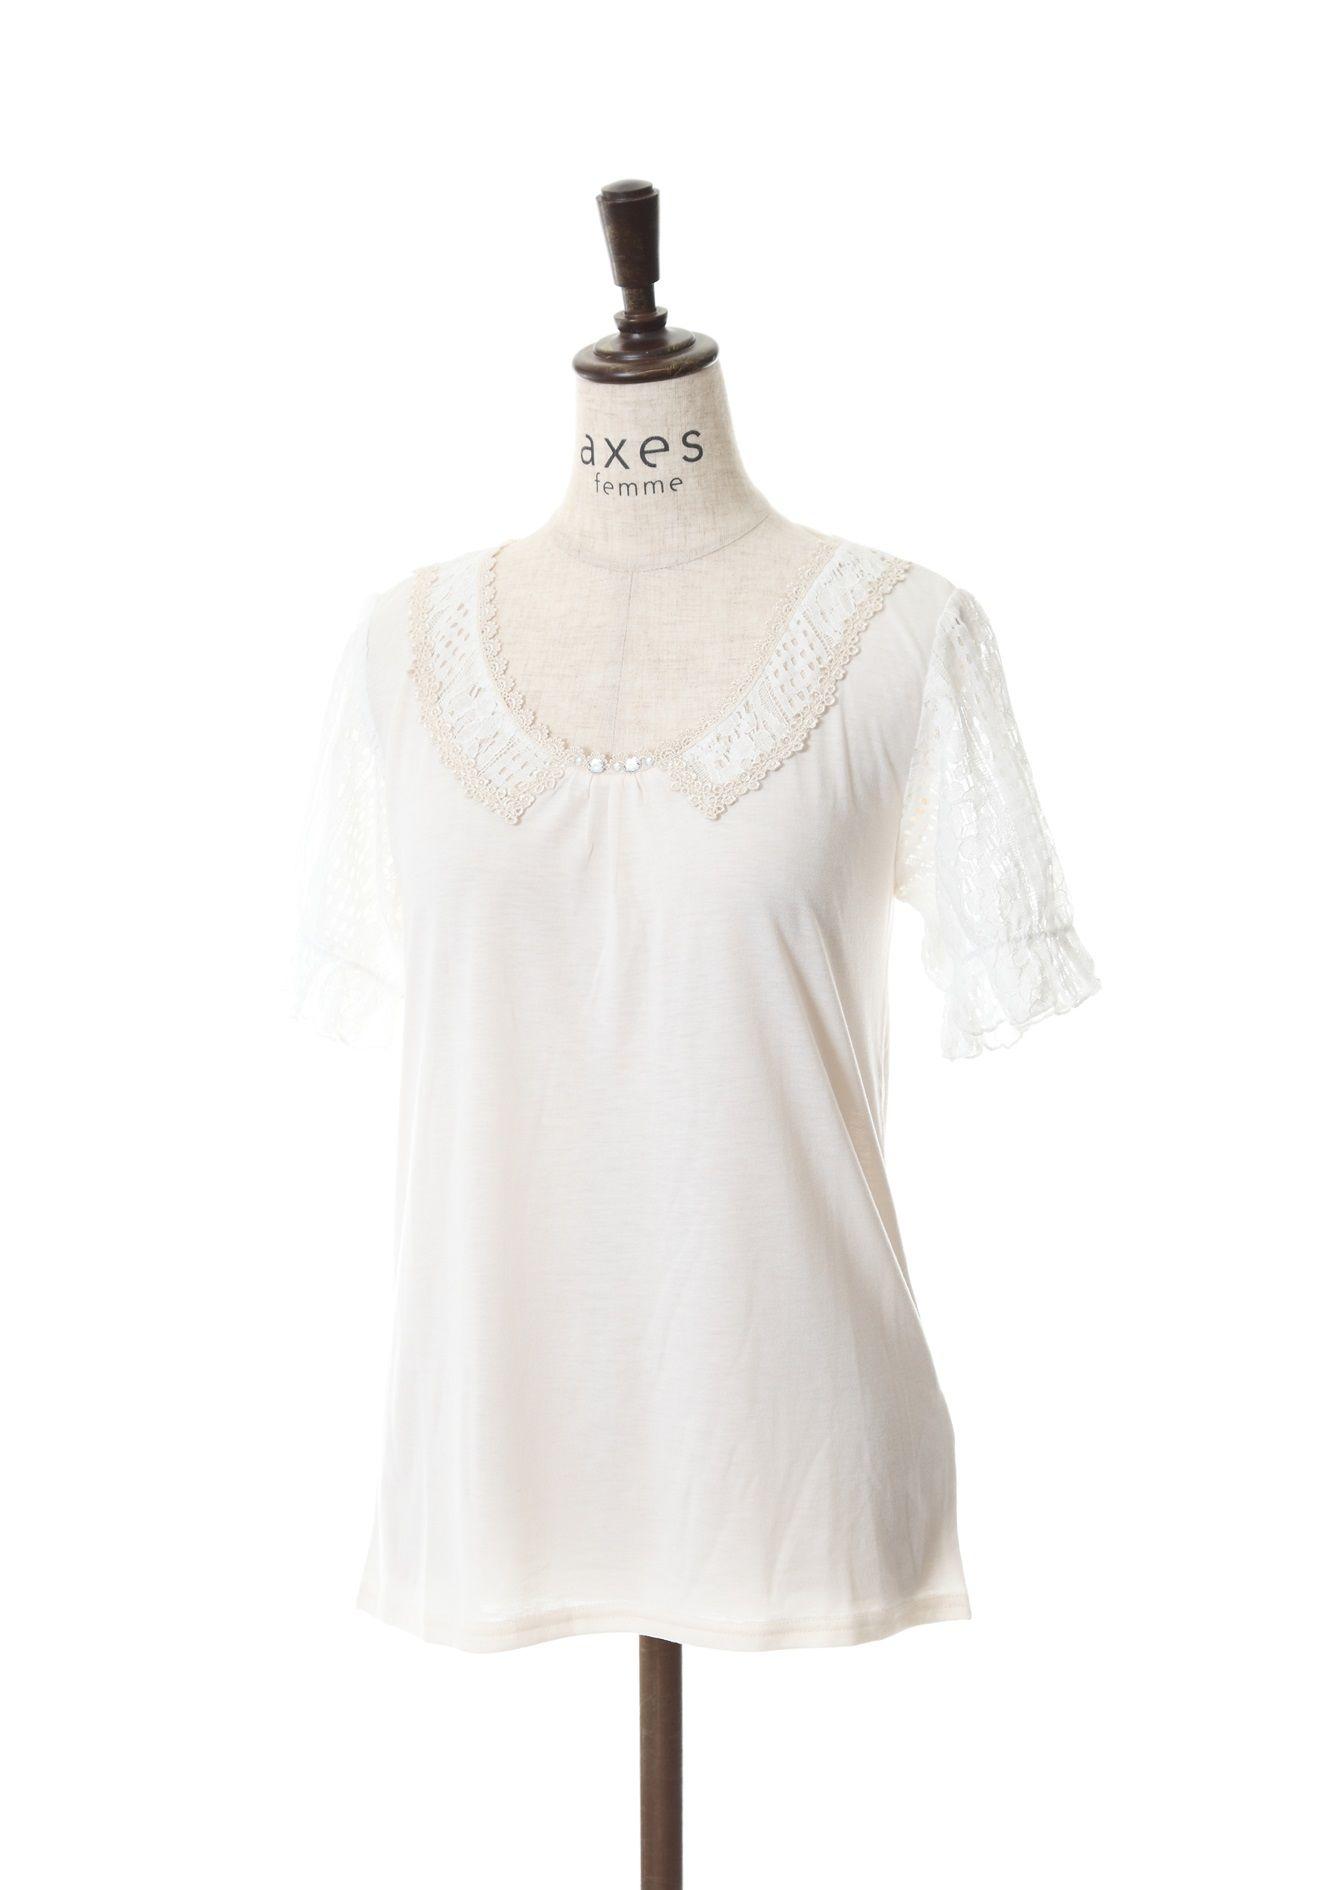 axes femme online shop|コットンレース使い半袖プルオーバー